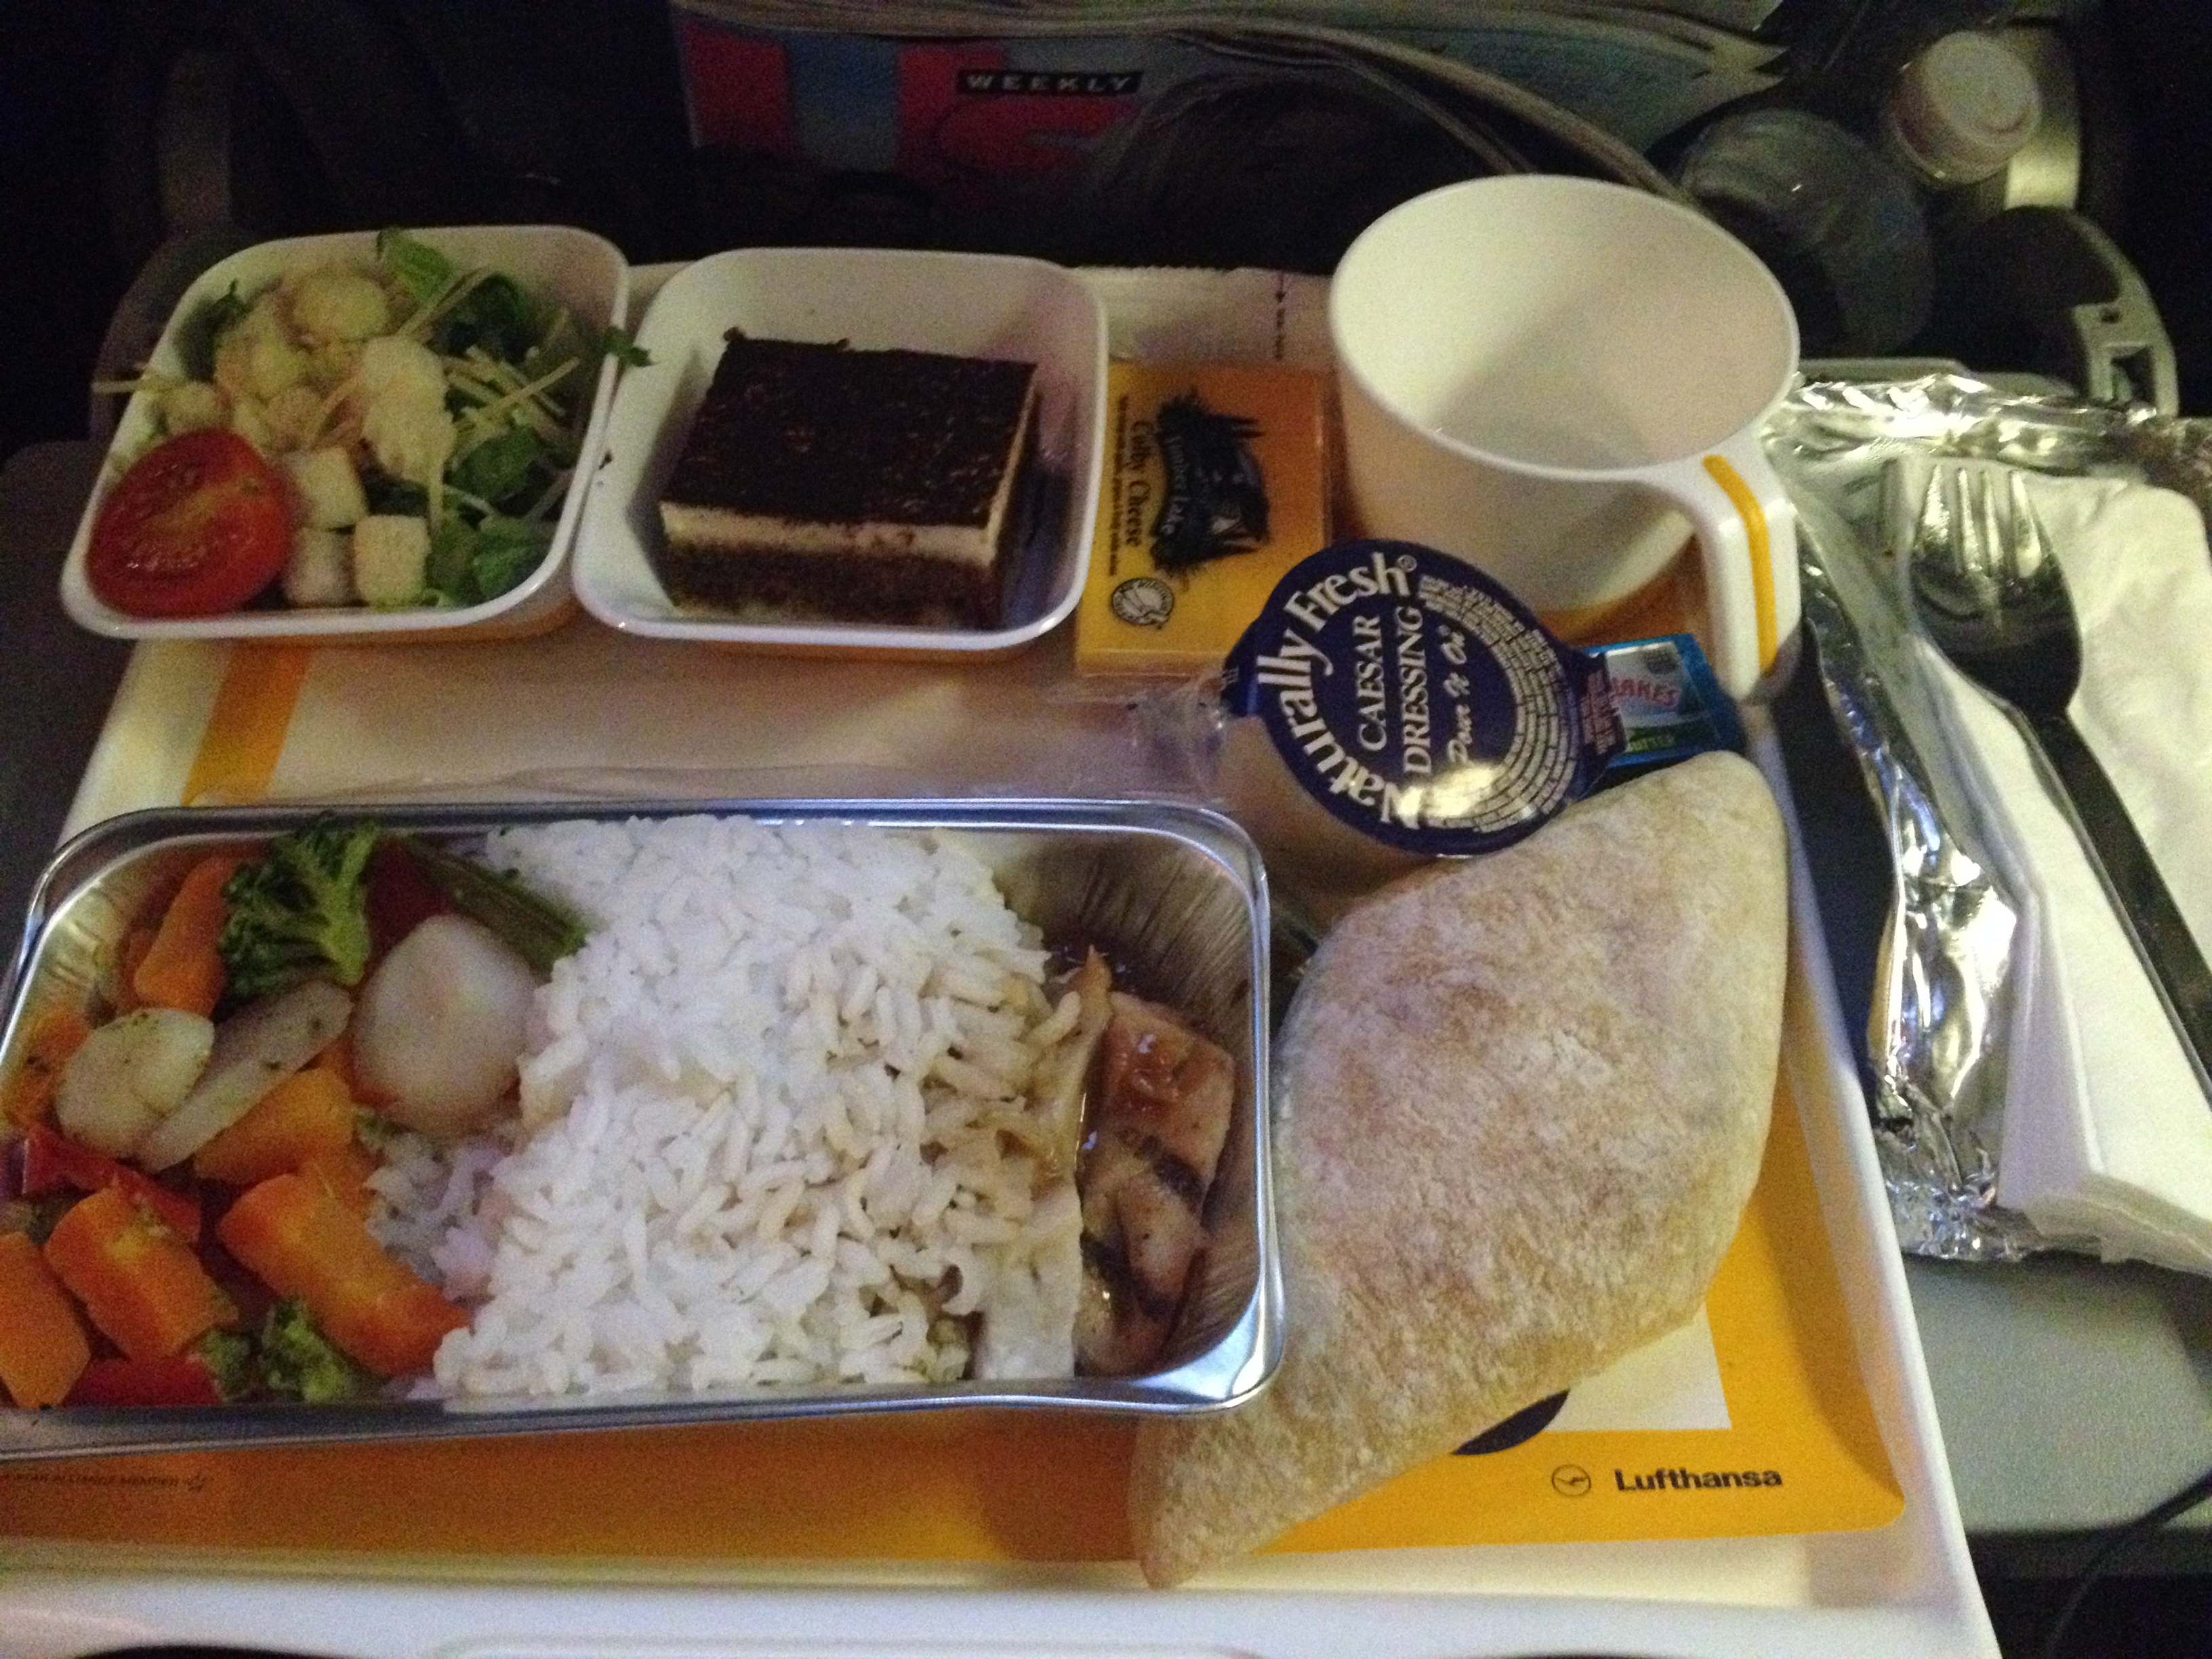 dinner in Lufthansa economy class